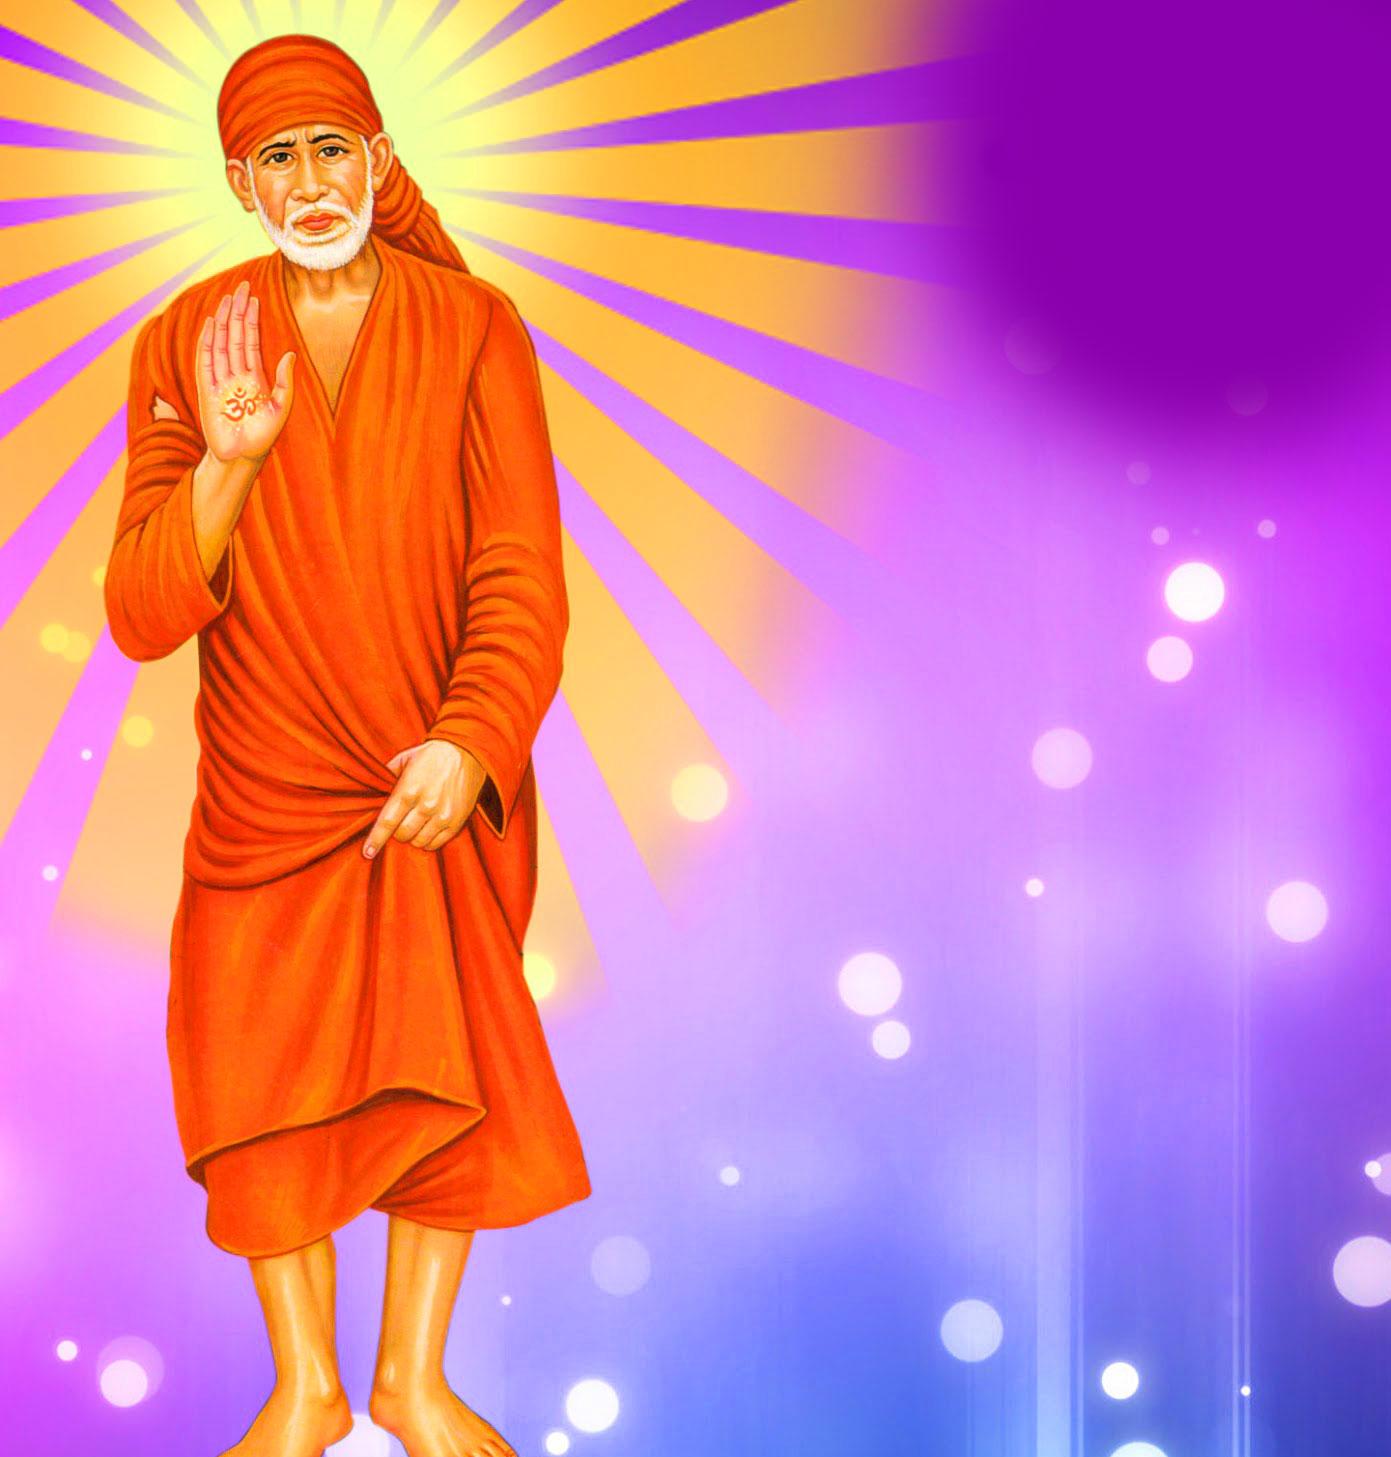 shirdi Sai Baba Blessing Images hd 2